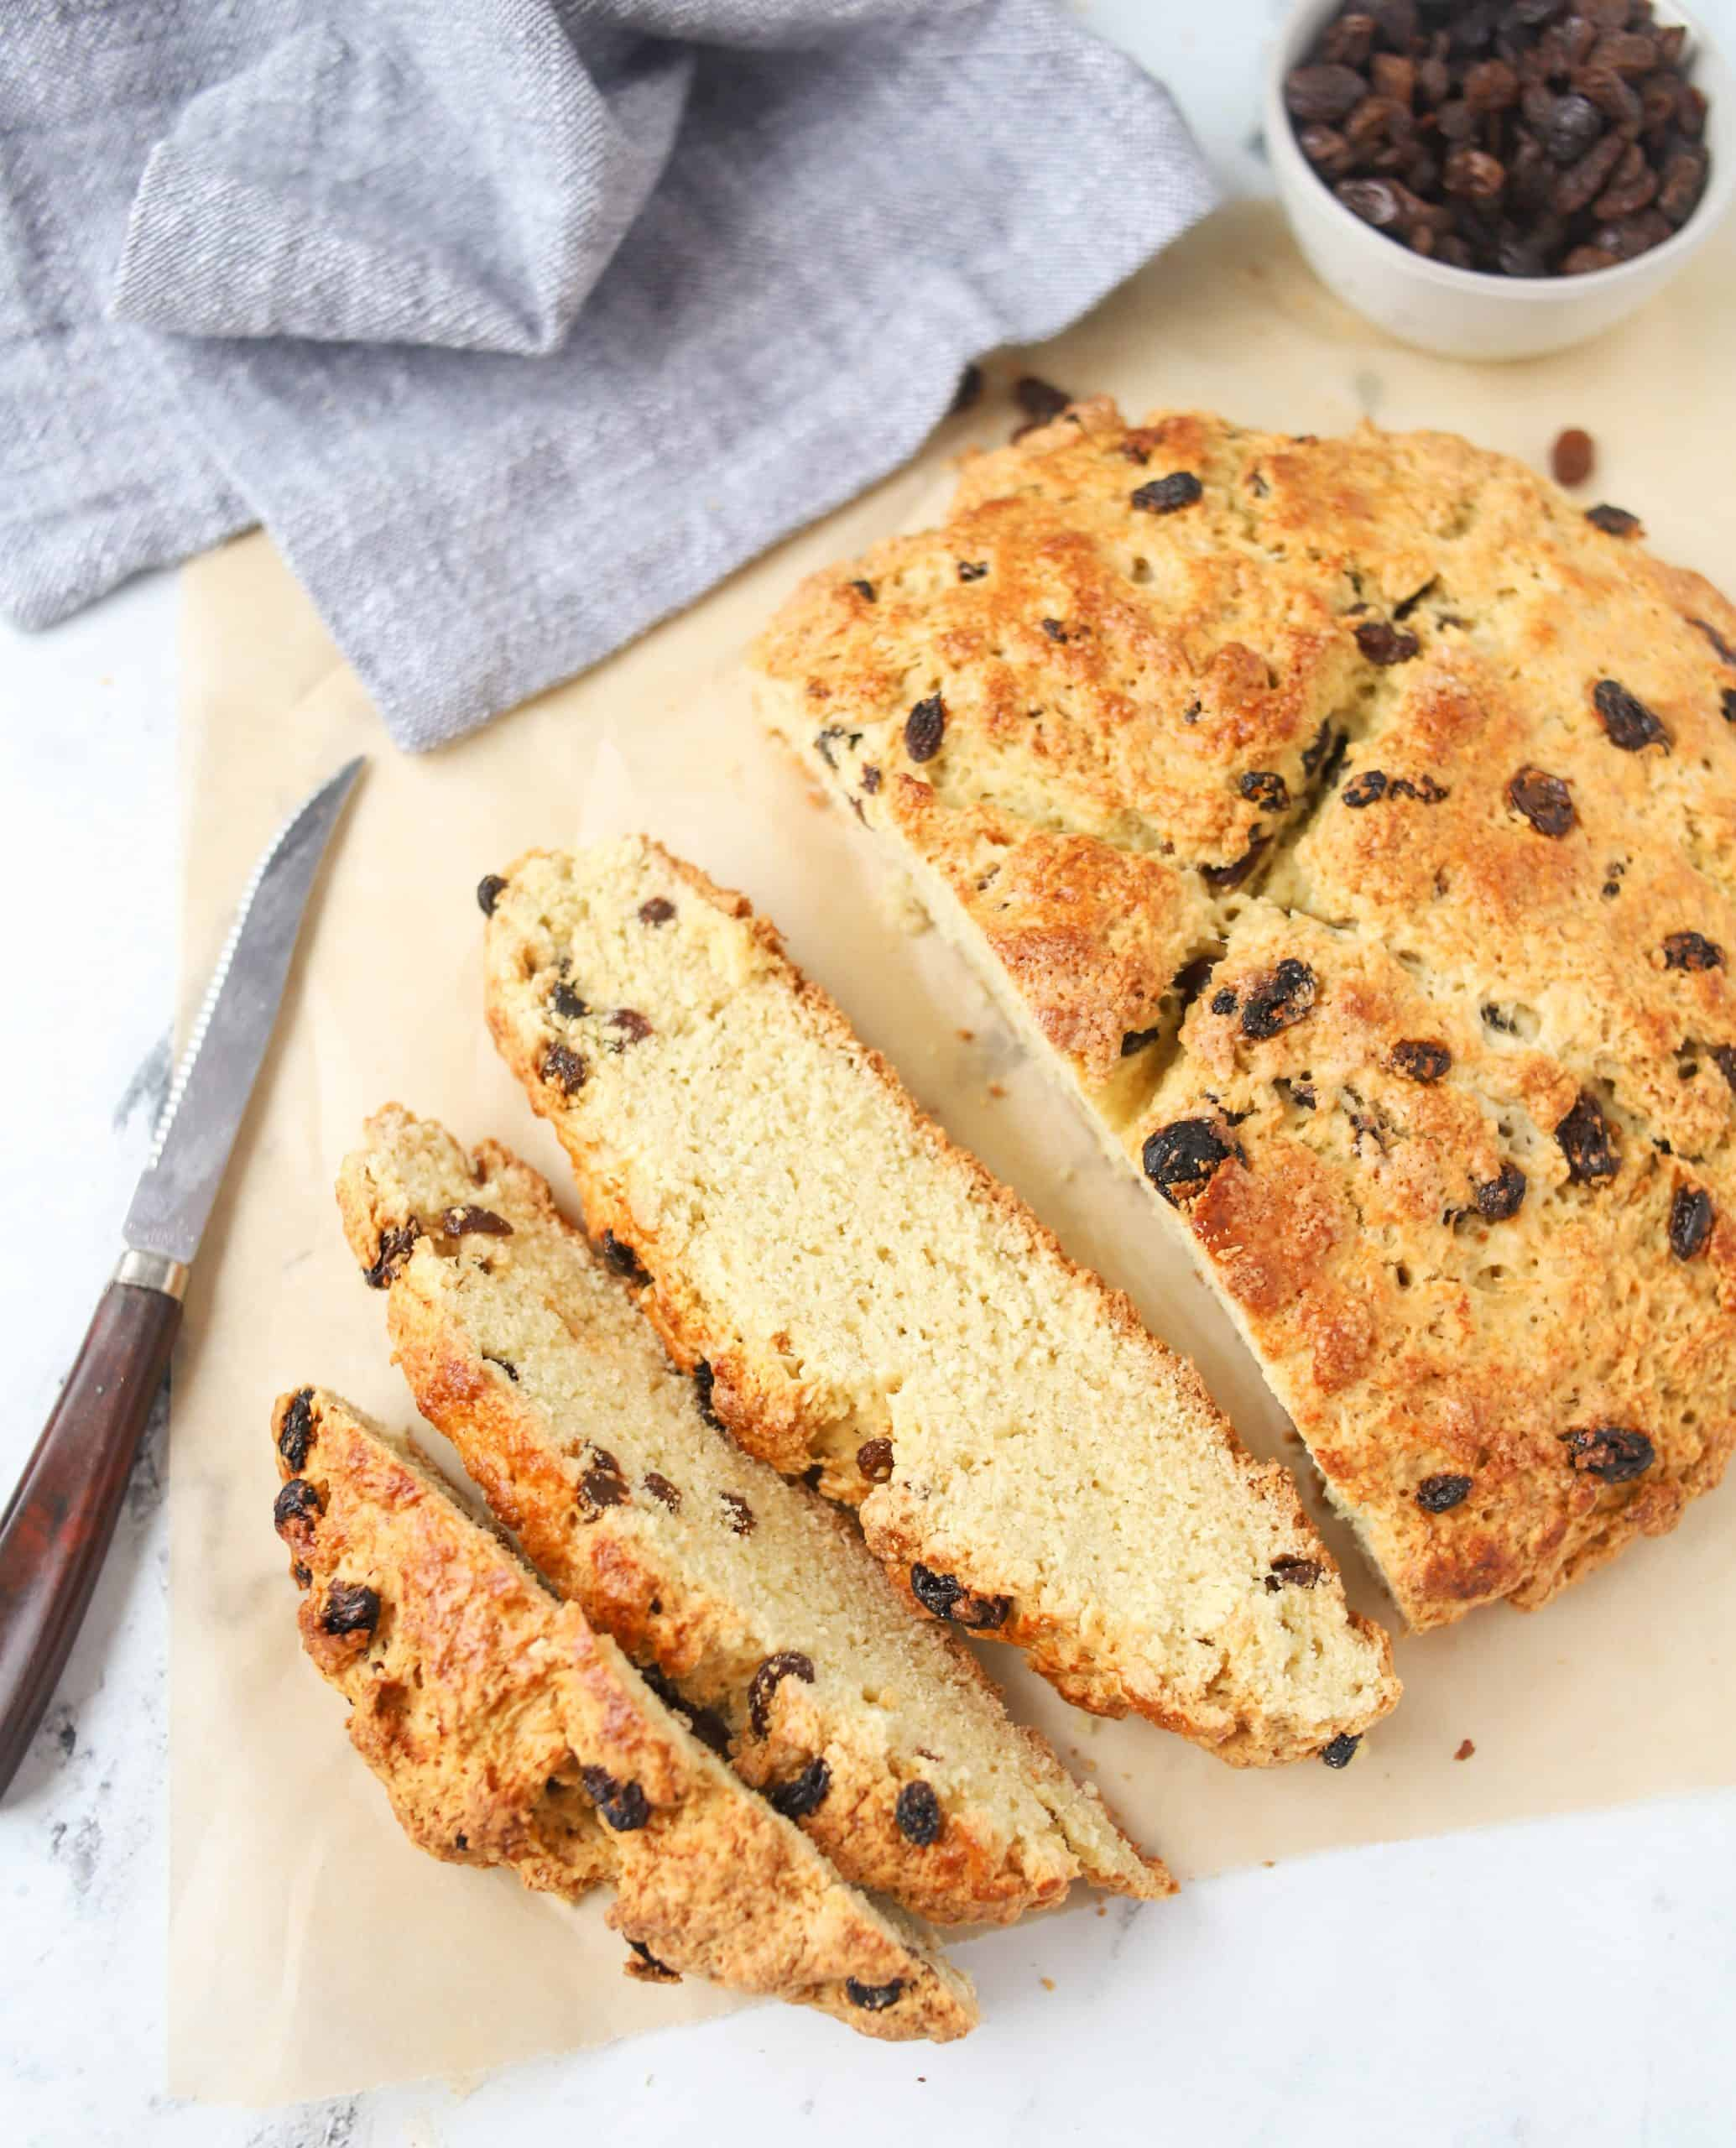 loaf of Irish soda bread sliced